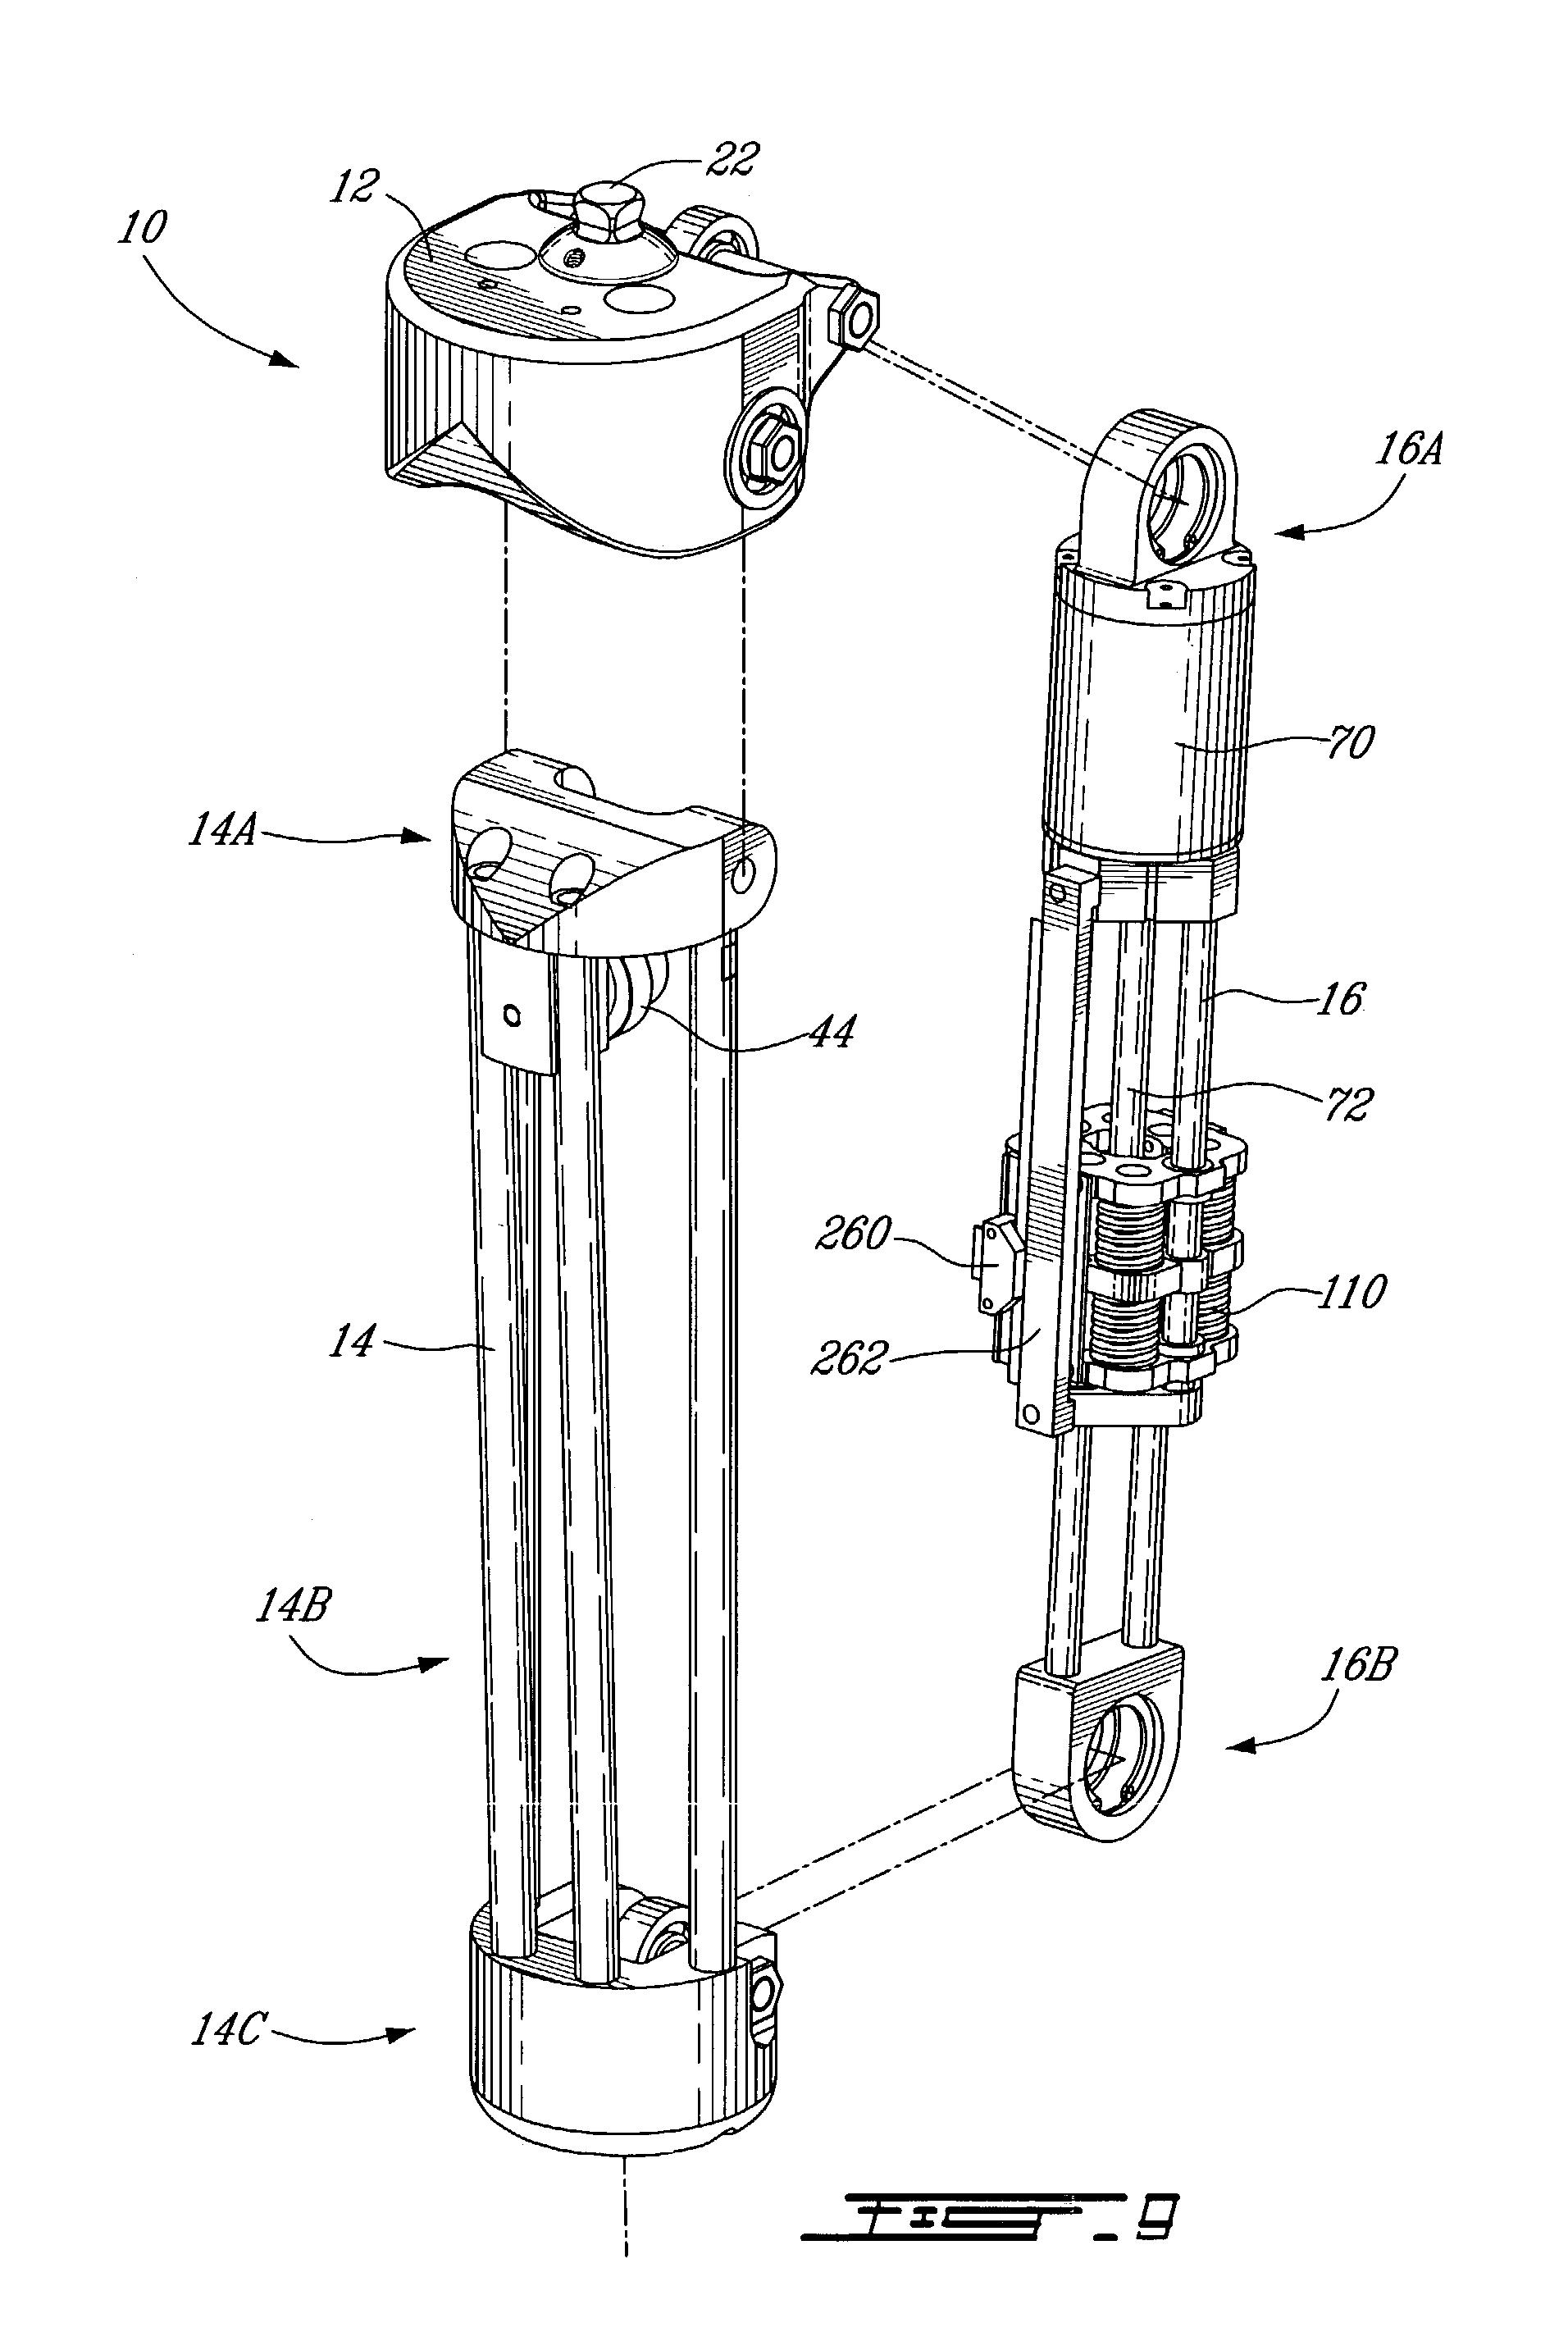 Diagram Of Knee